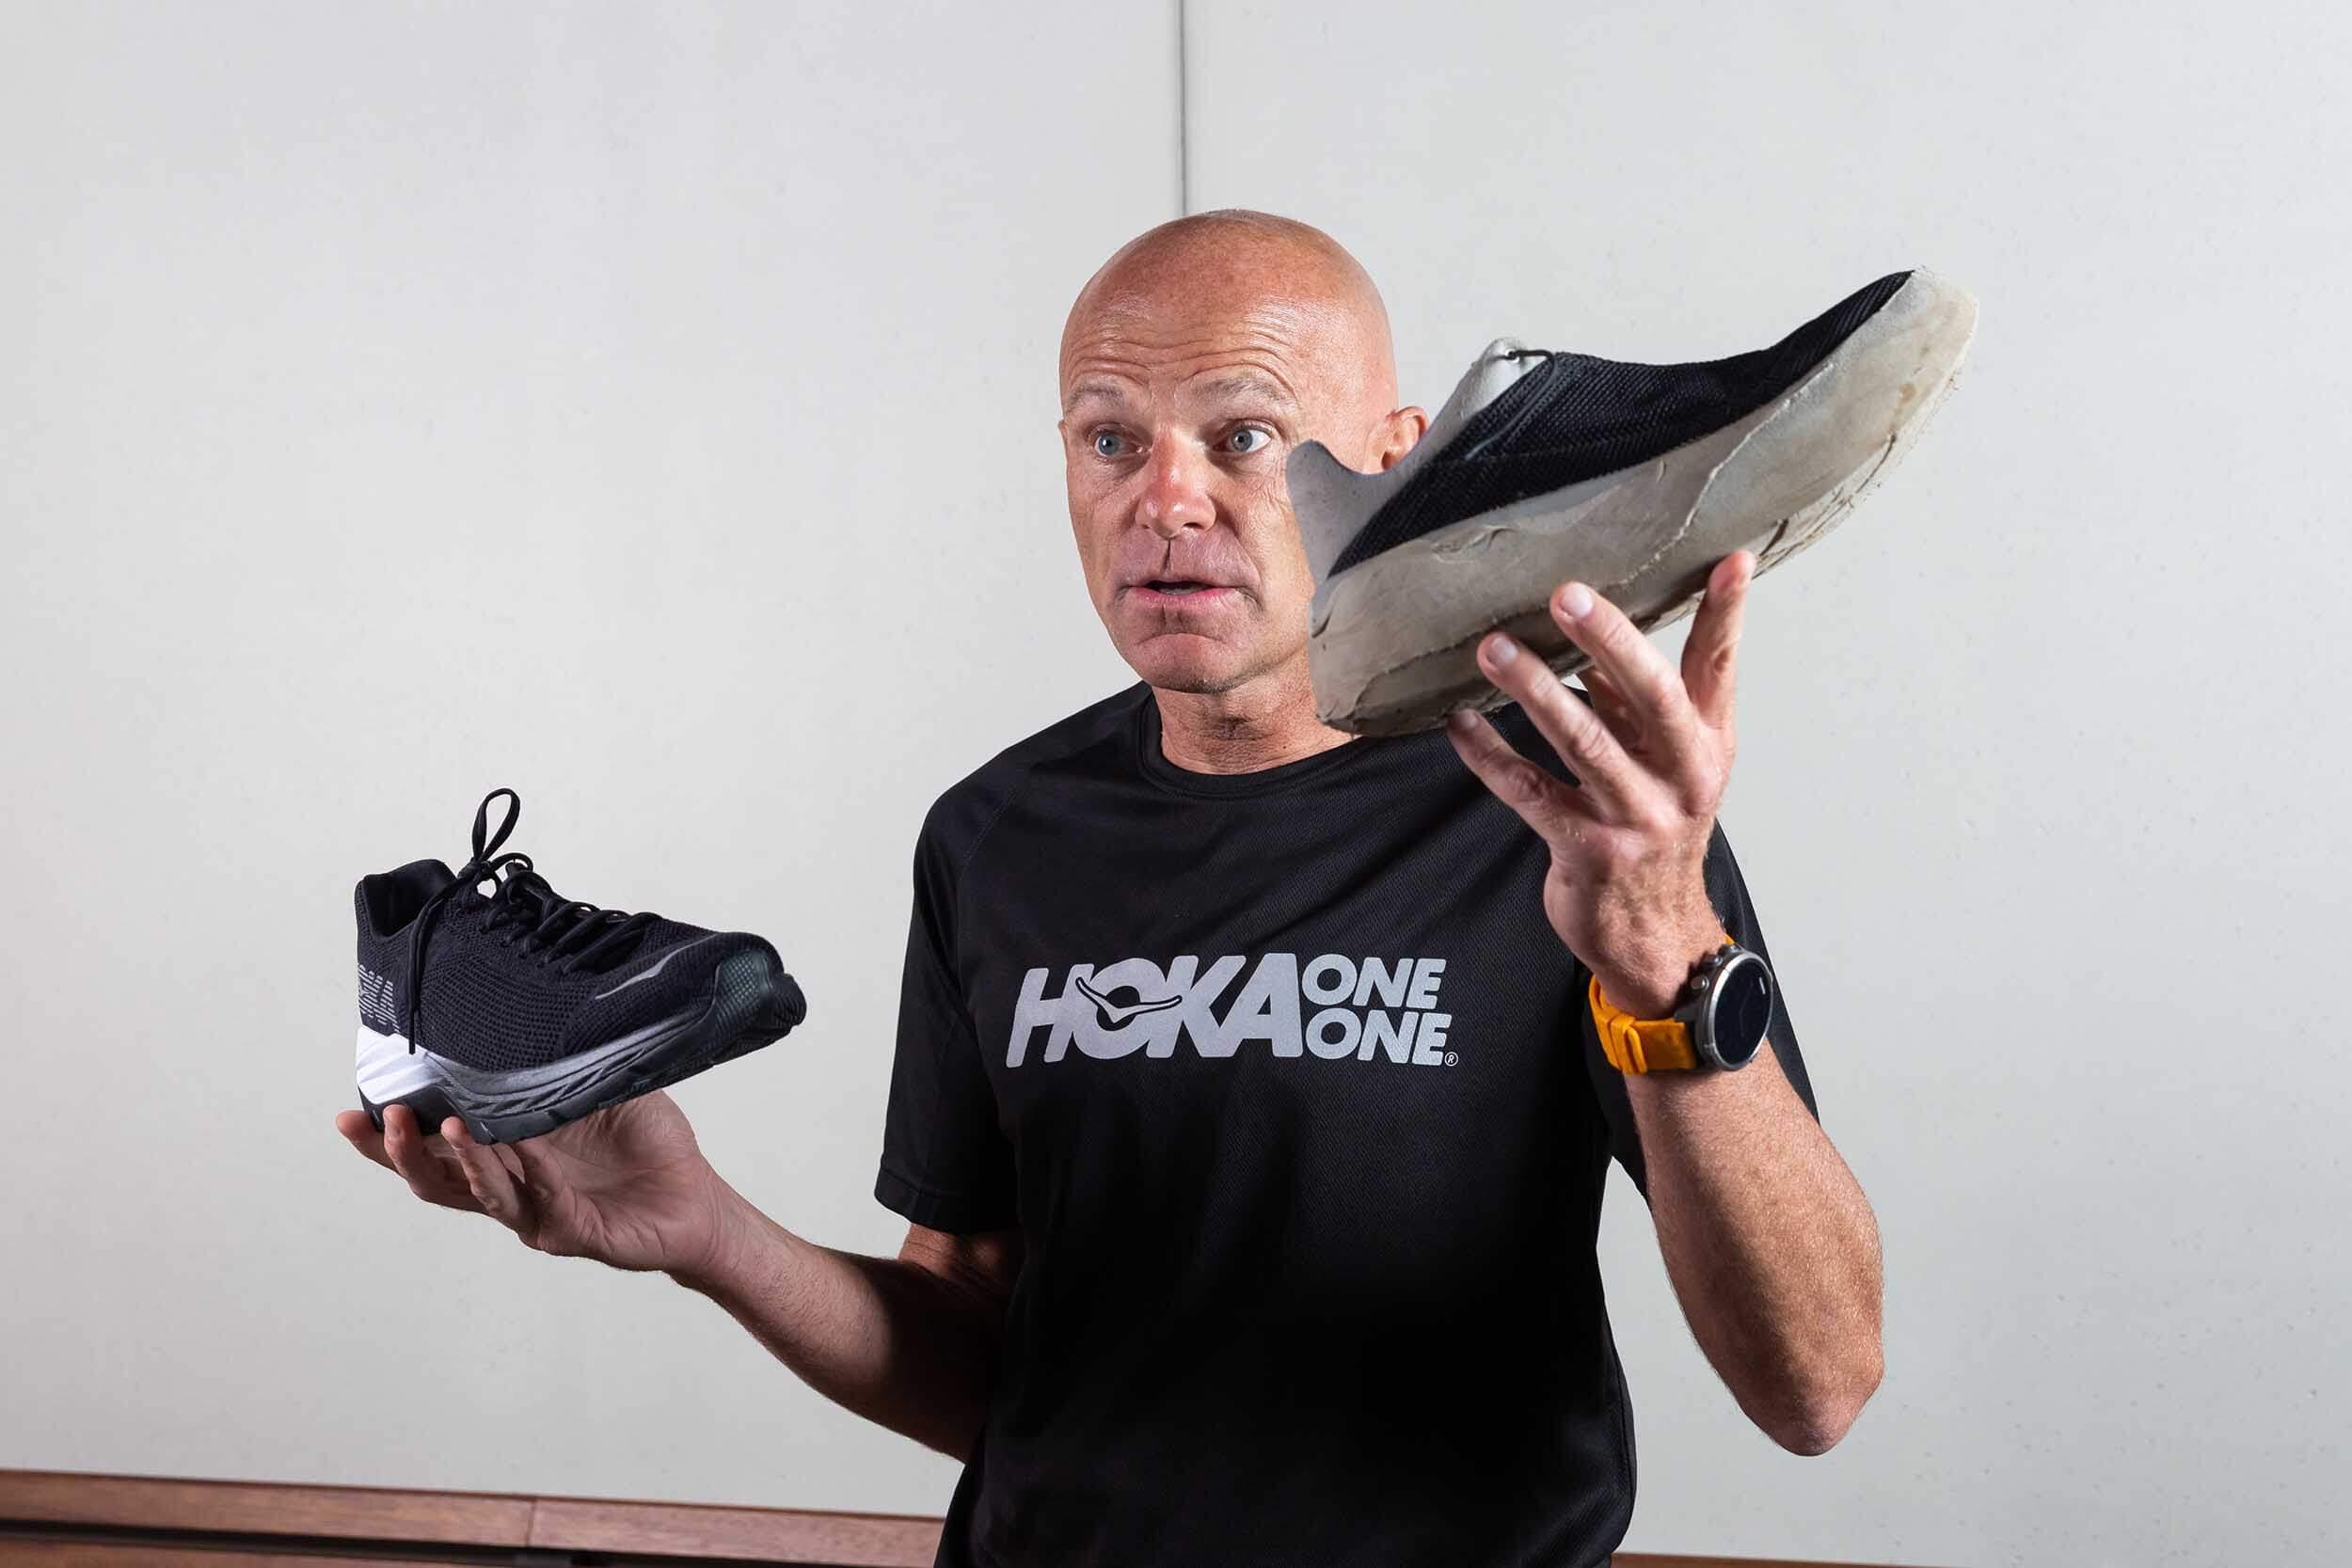 HOKA co-founder Nico Mermoud explains the evolution of the HOKA brand